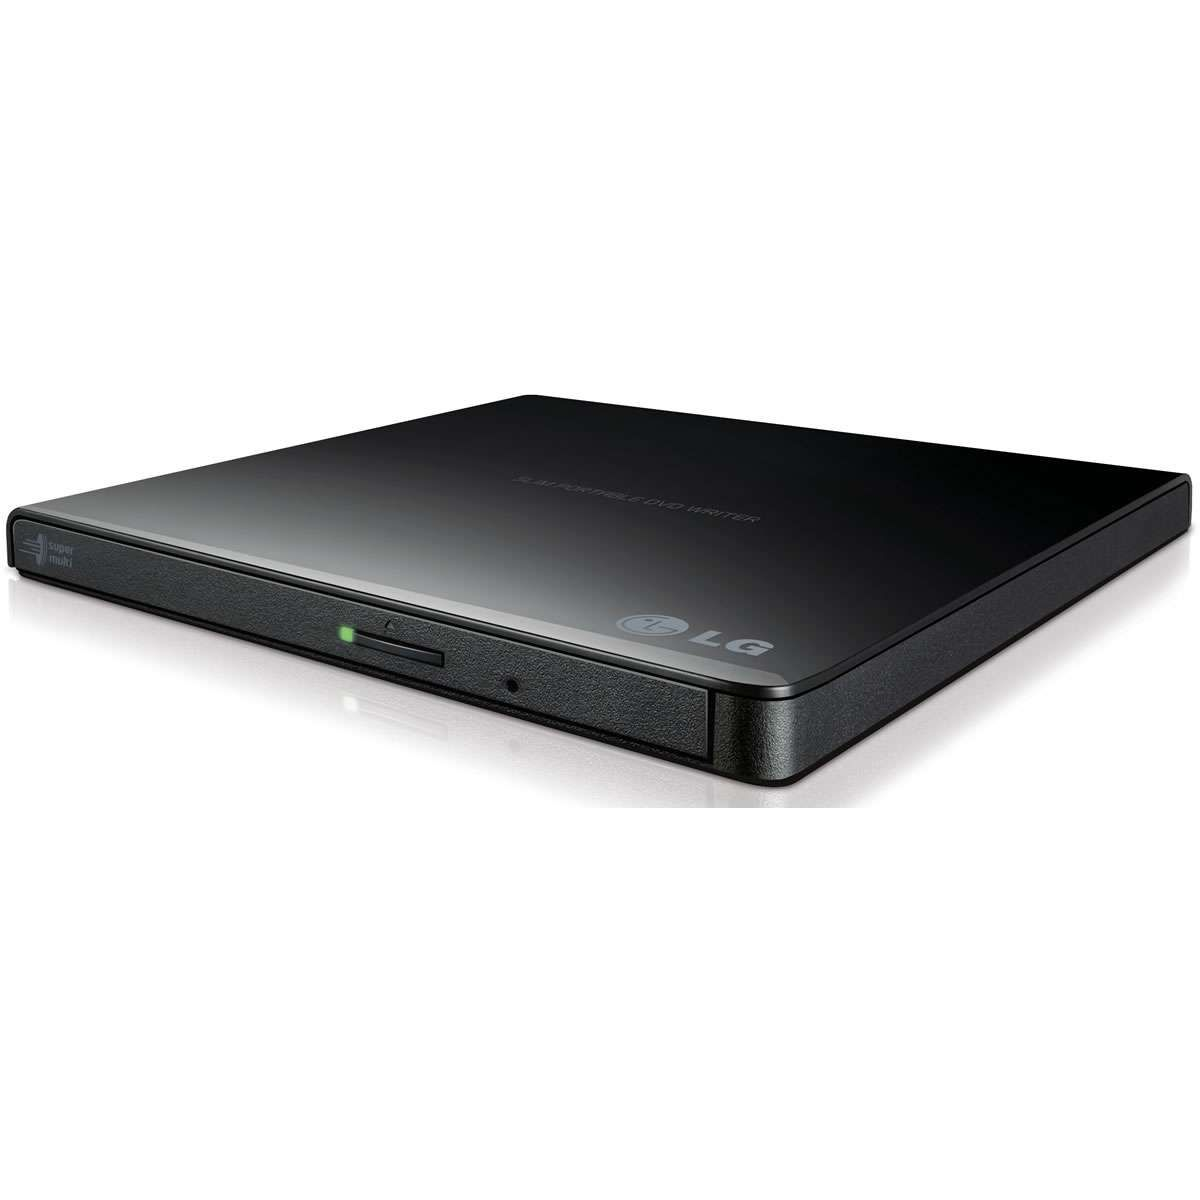 Gravador DVDRW LG Externo GP65NB60.AVAR10B Preto